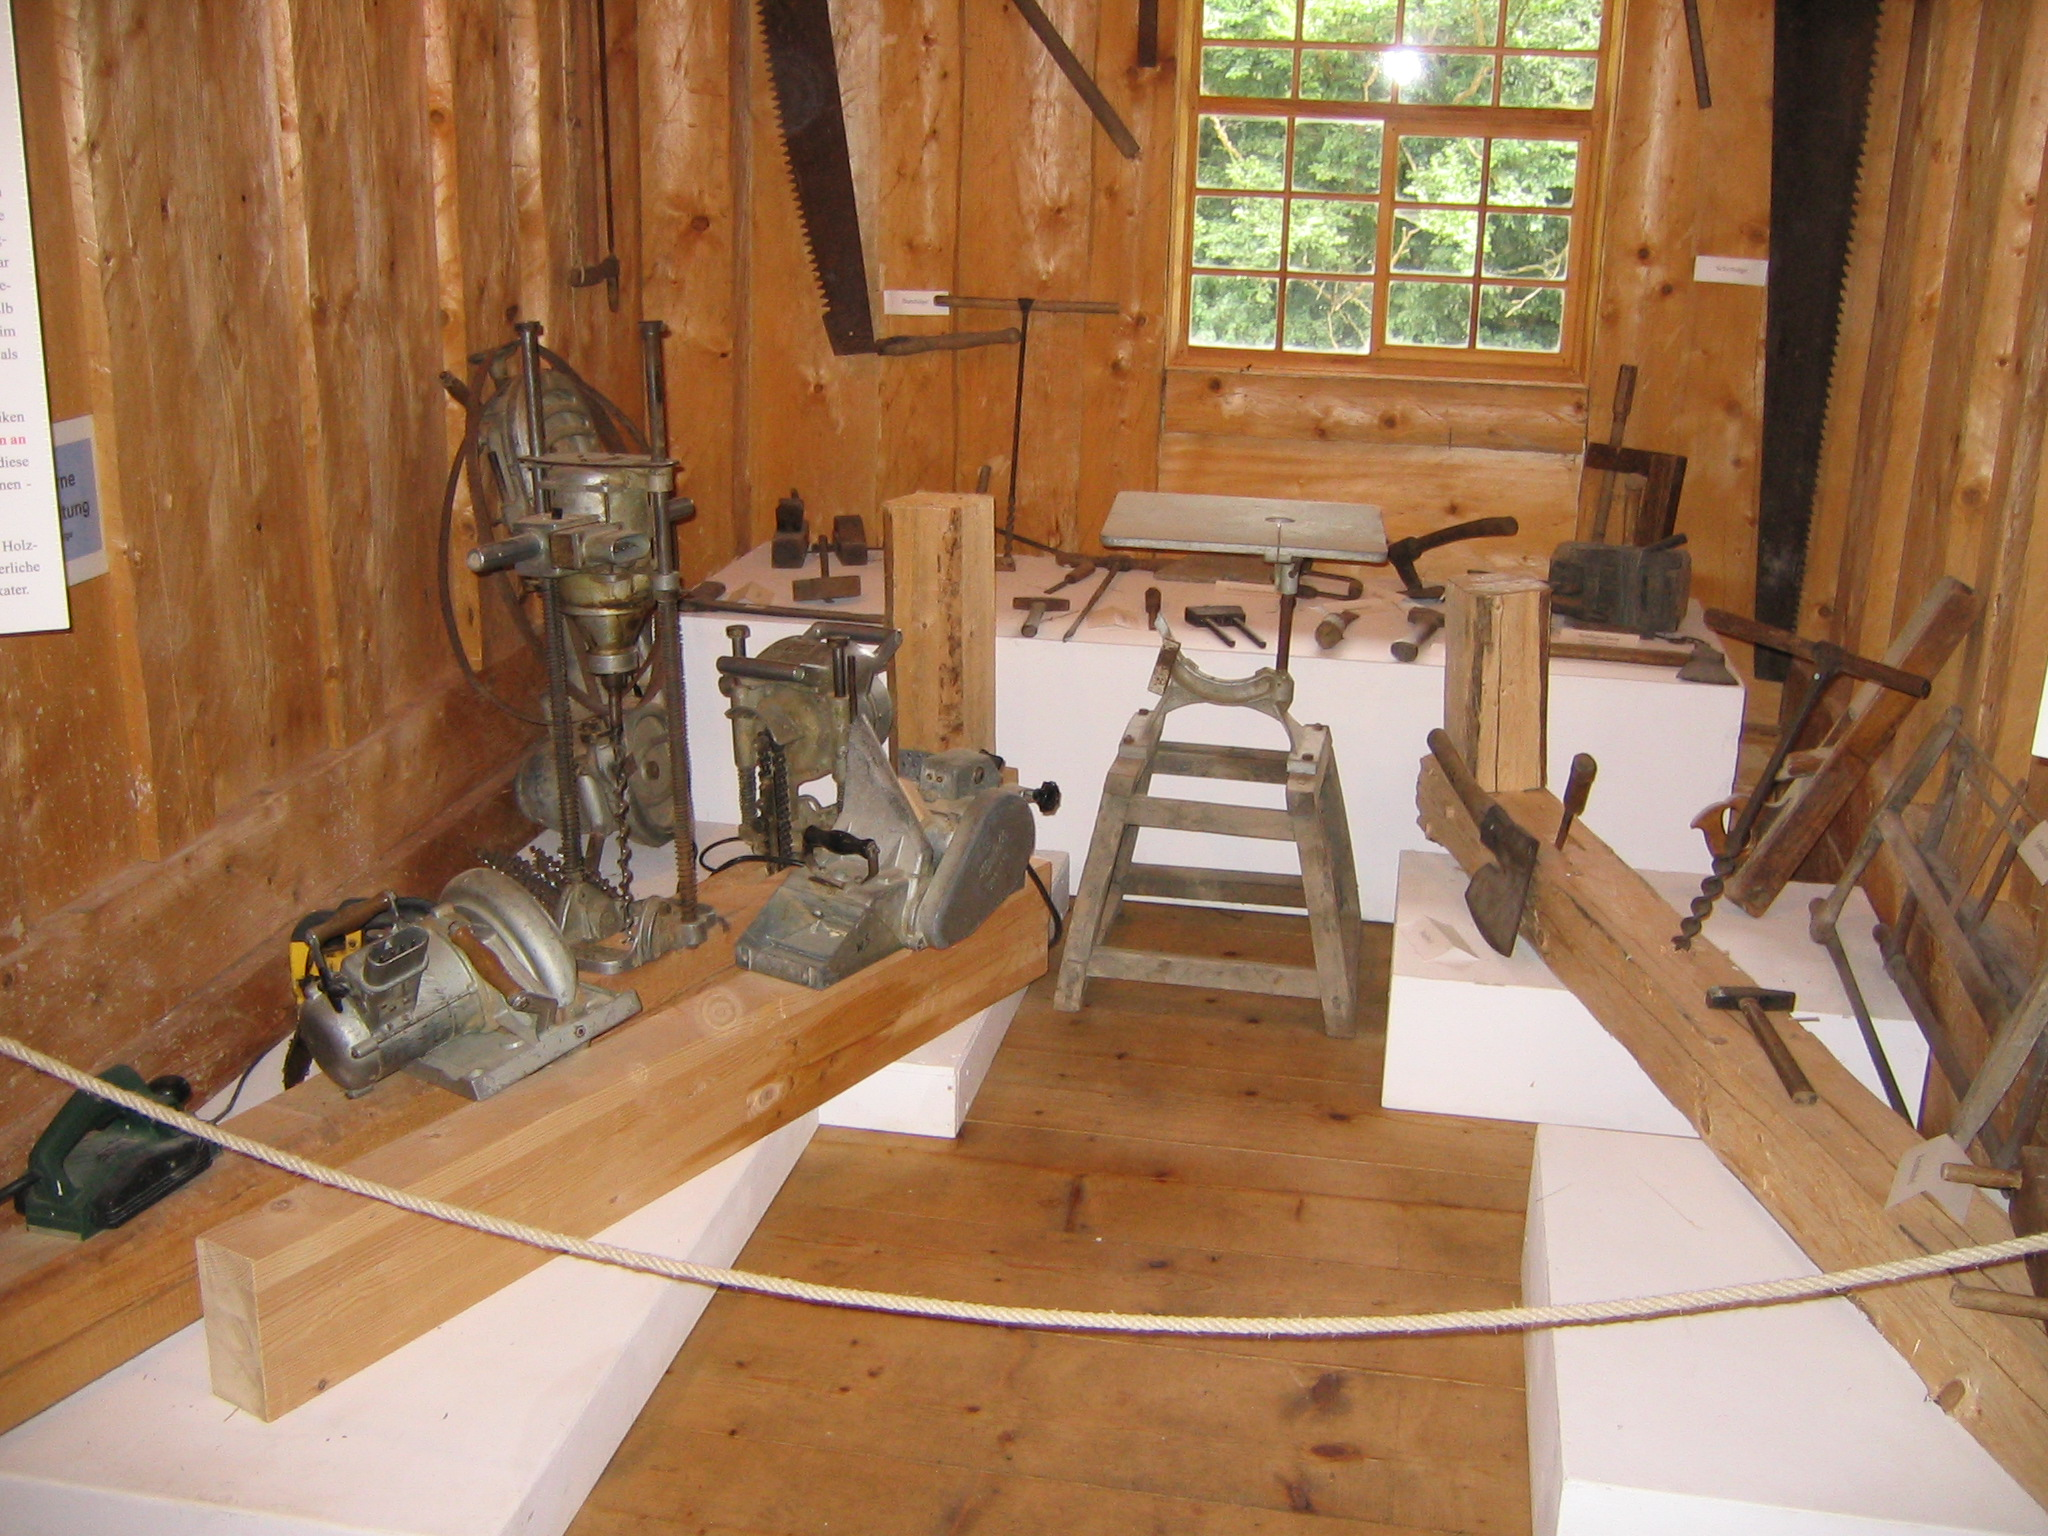 File:Noe carpenters tools.jpg - Wikimedia Commons